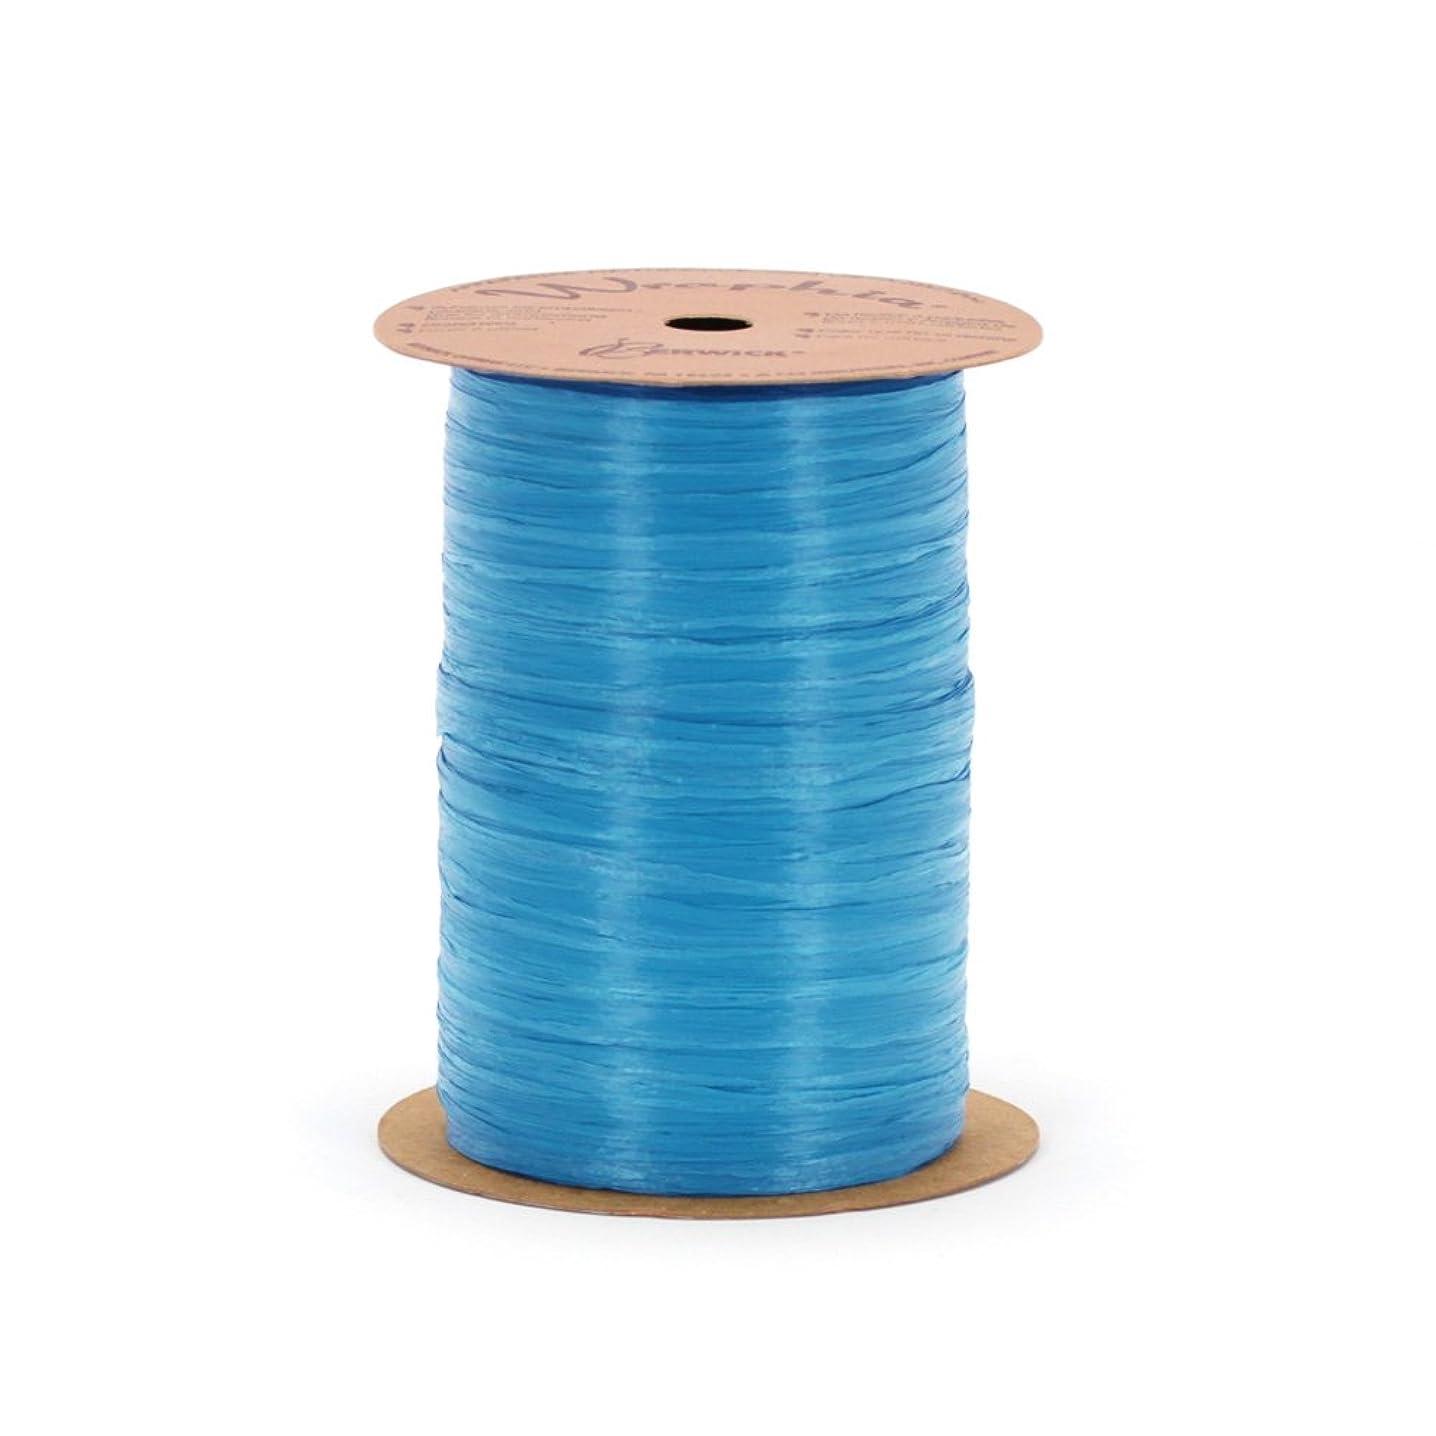 Berwick Offray 1/4'' Wide Matte Raffia Ribbon, Light Blue, 100 Yards